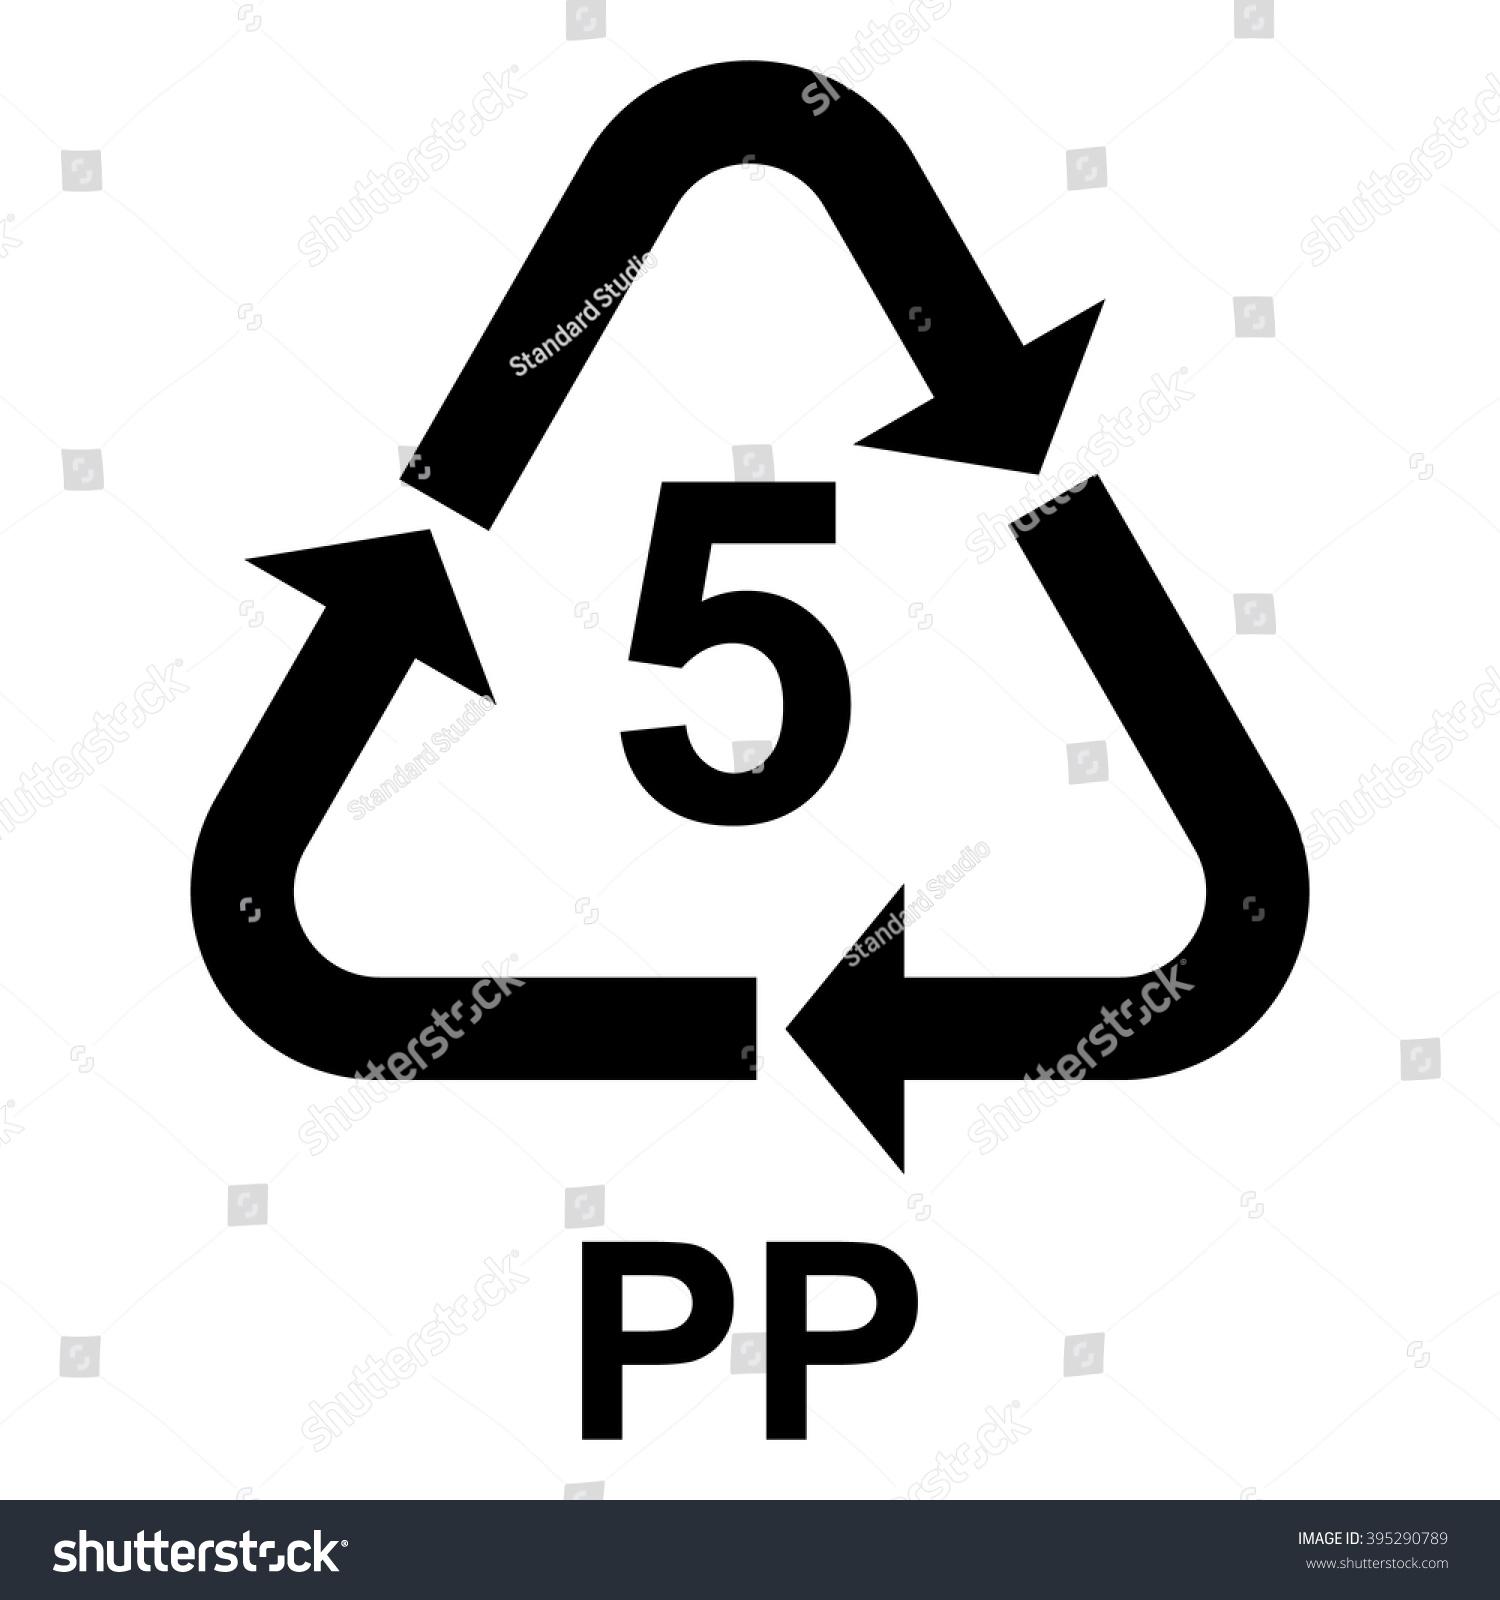 Plastic recycling symbol pp 5 plastic stock vector 395290789 plastic recycling symbol pp 5 plastic recycling code pp 5 vector illustration biocorpaavc